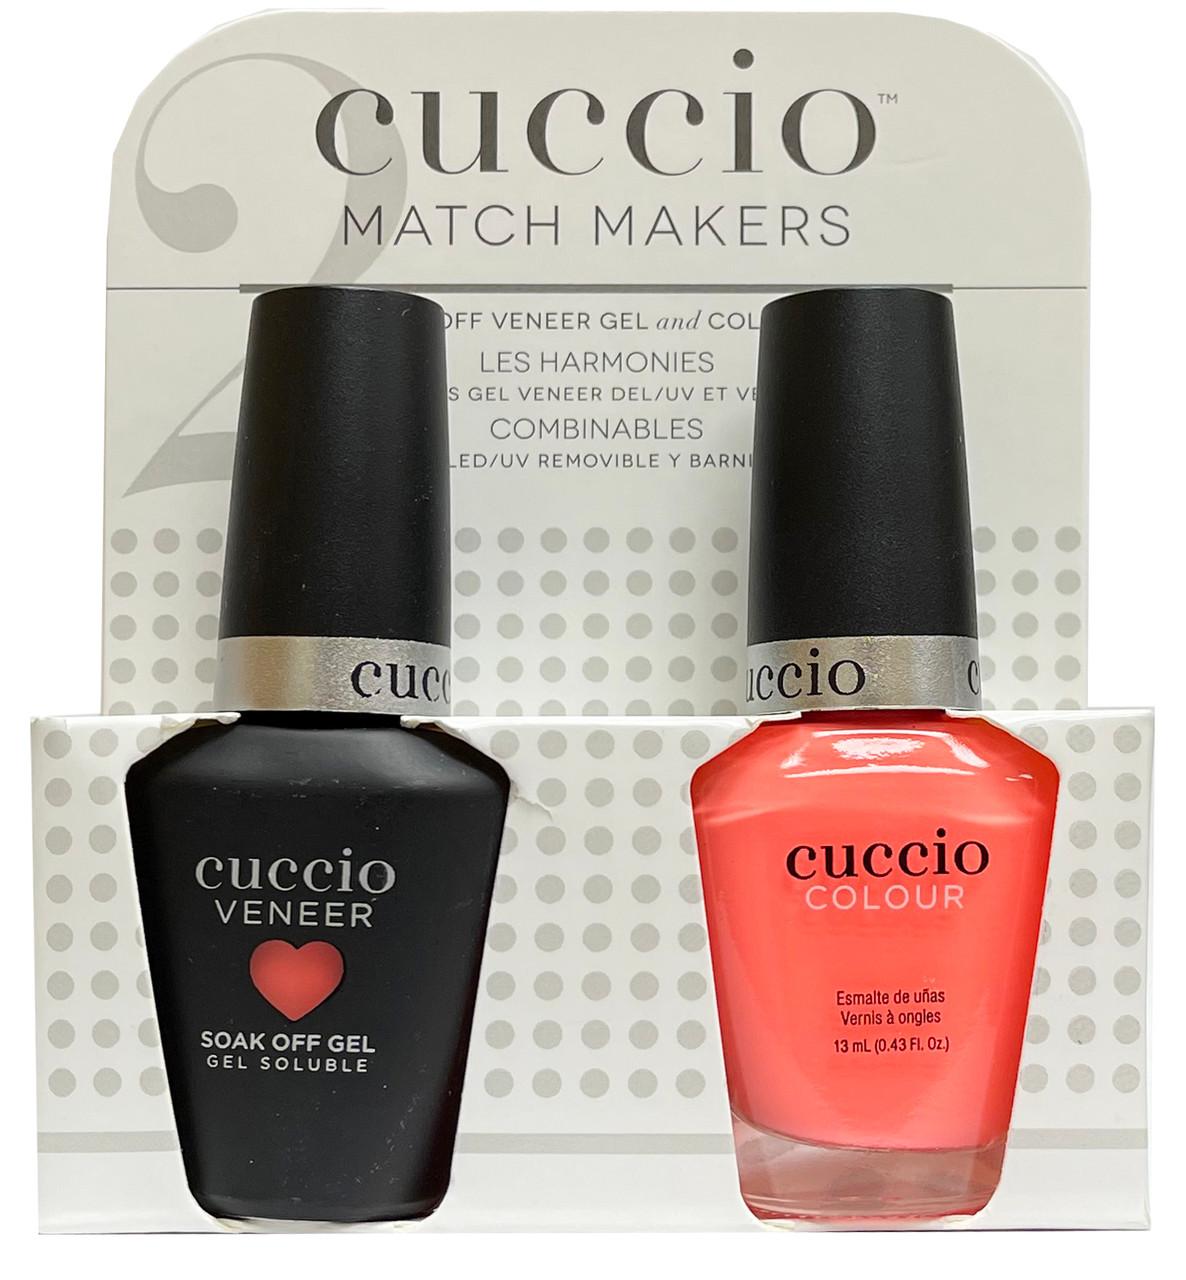 CUCCIO Gel Color MatchMakers Paradise City - 0.43oz / 13 mL